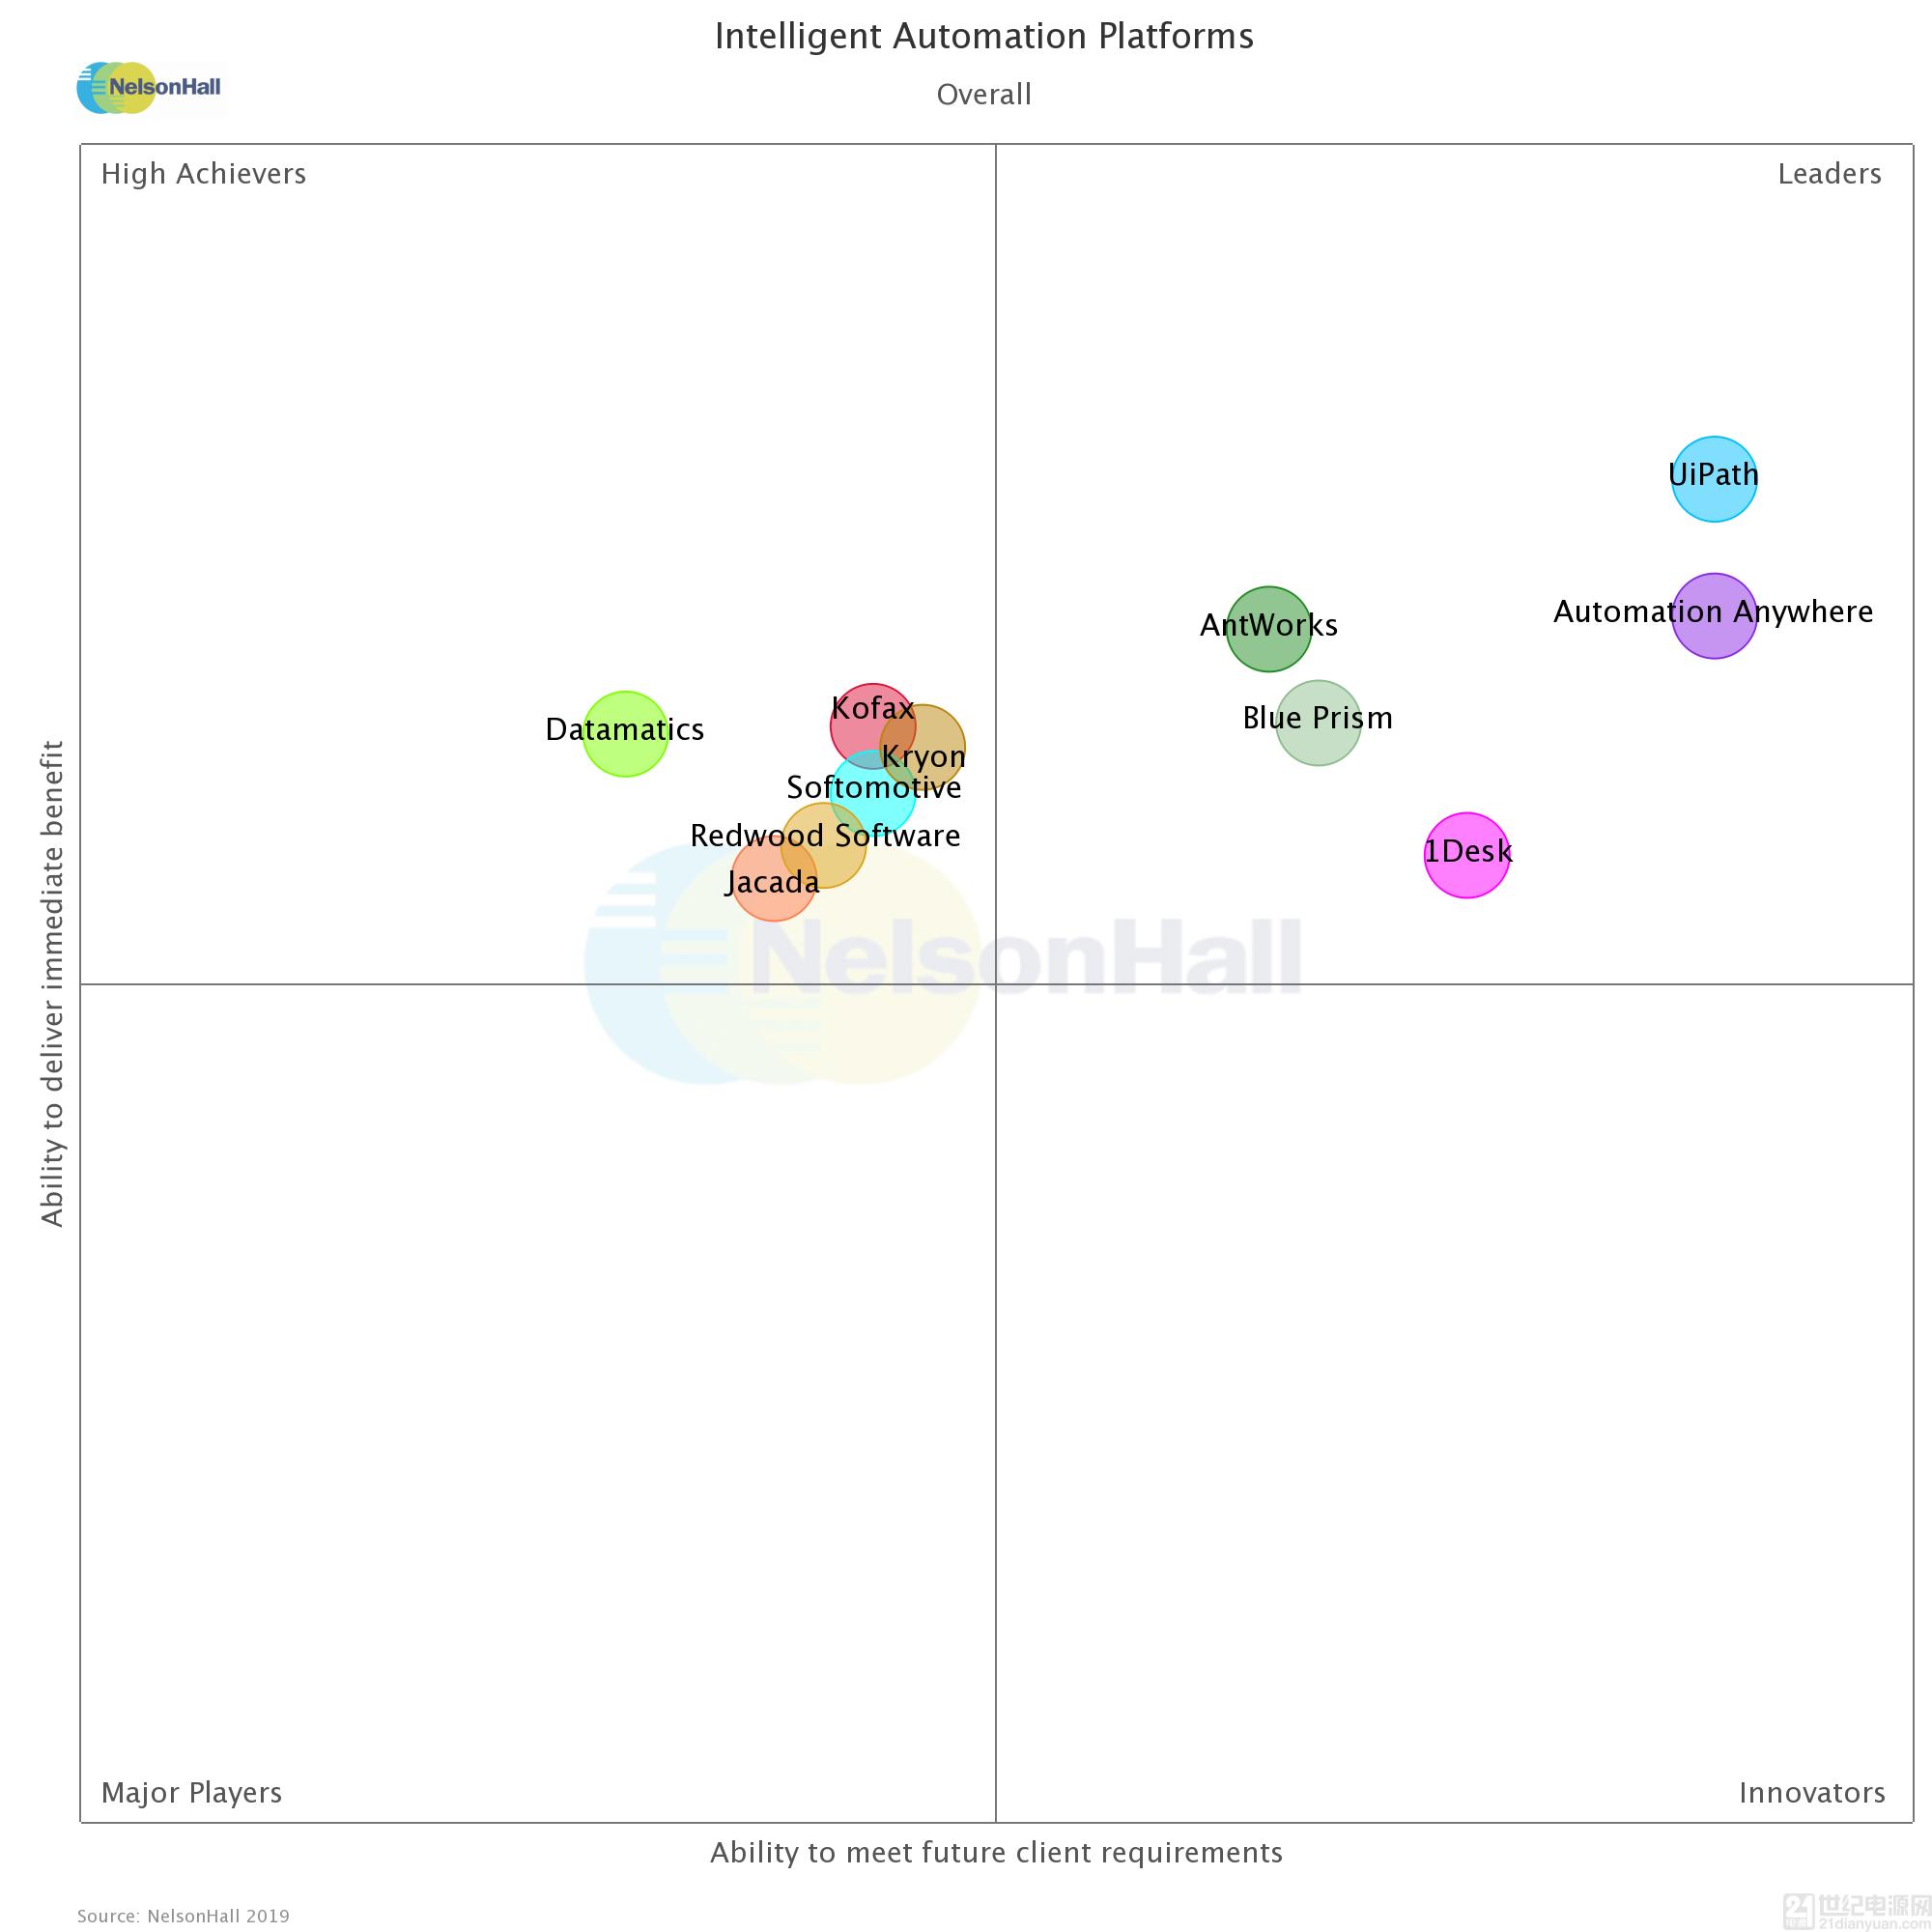 AntWorks 被 NelsonHall 的 NEAT 评为智能自动化平台领导者